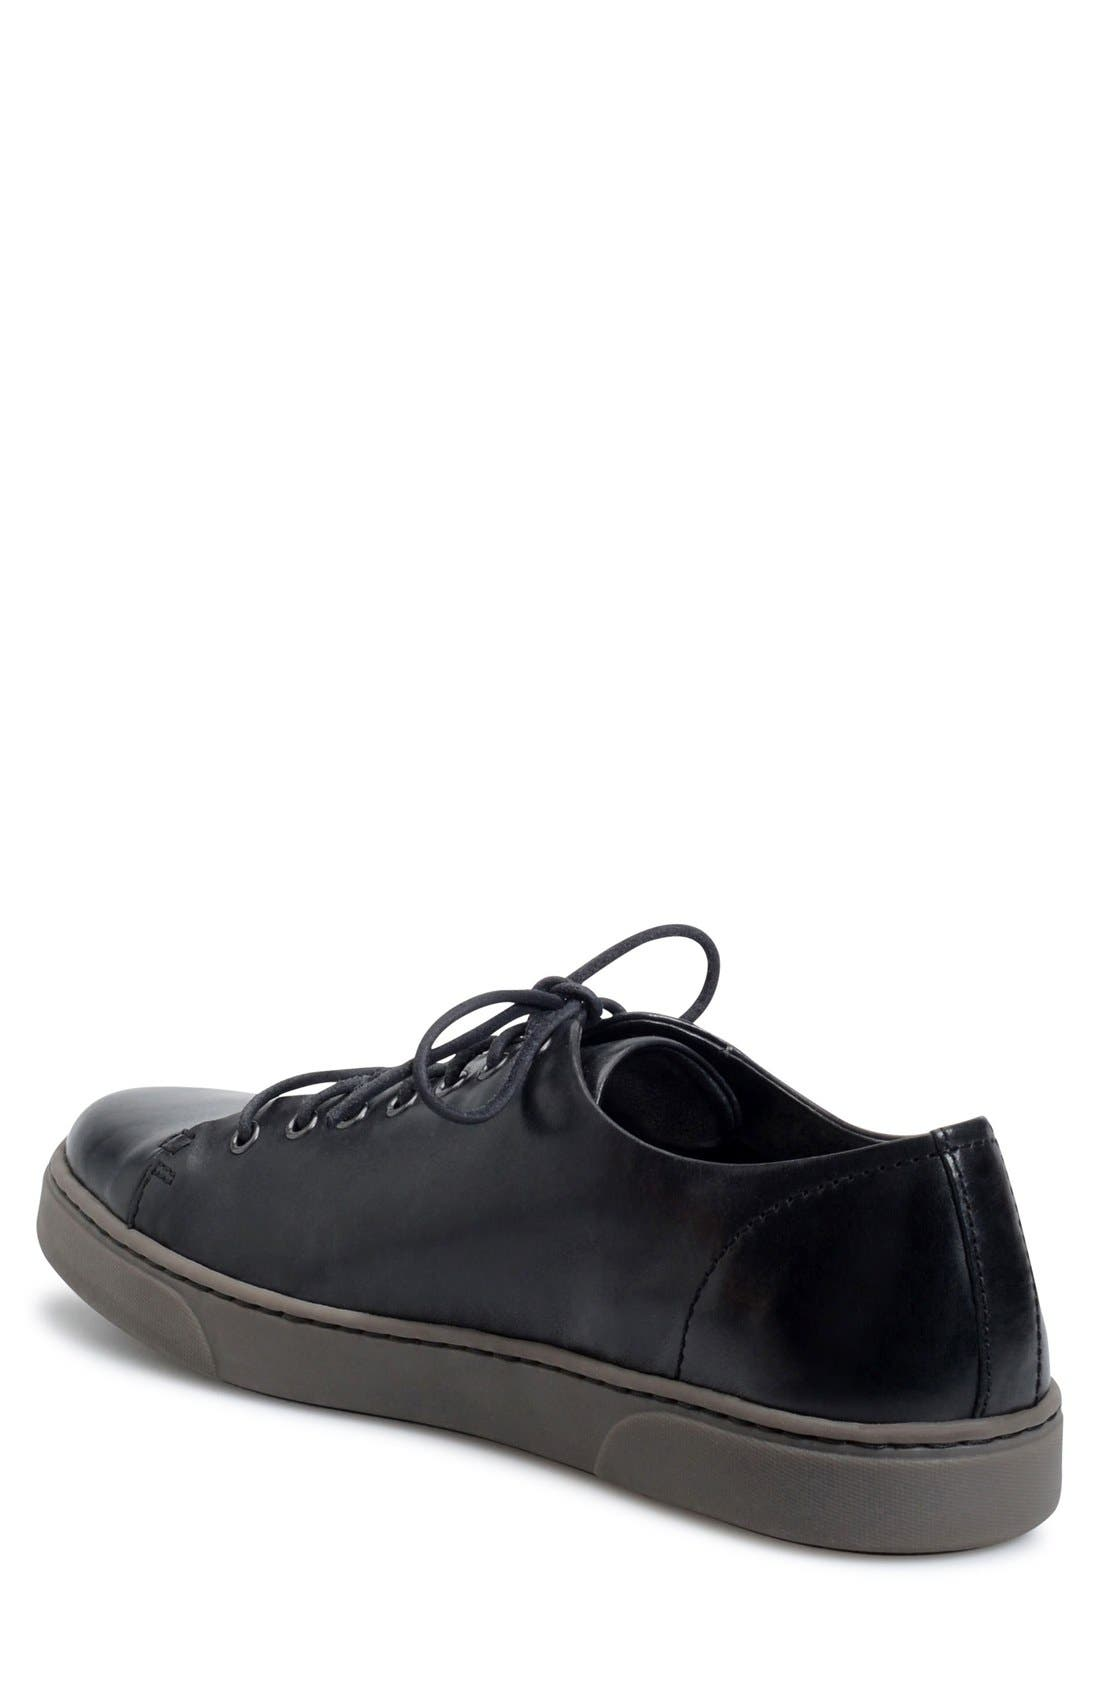 'Bayne' Cap Toe Sneaker,                             Alternate thumbnail 10, color,